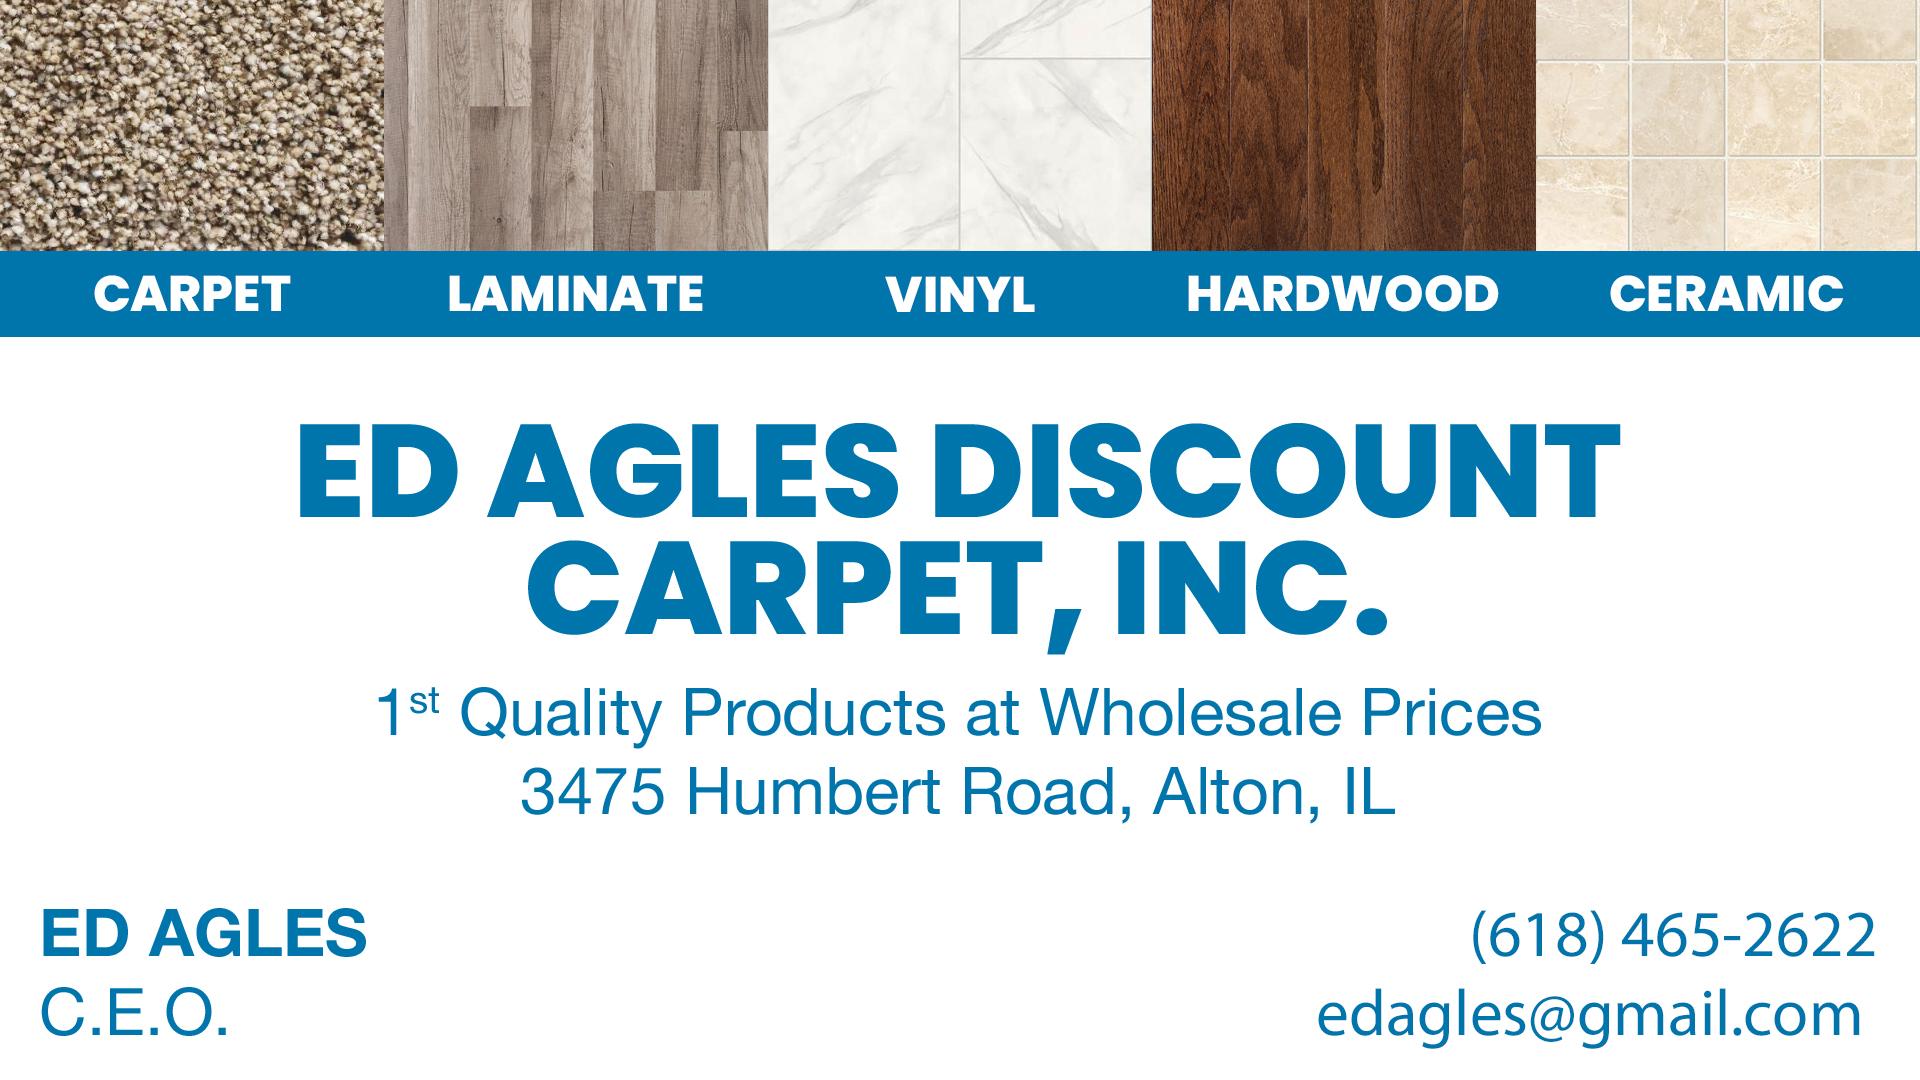 Ed Agles Discount Carpet